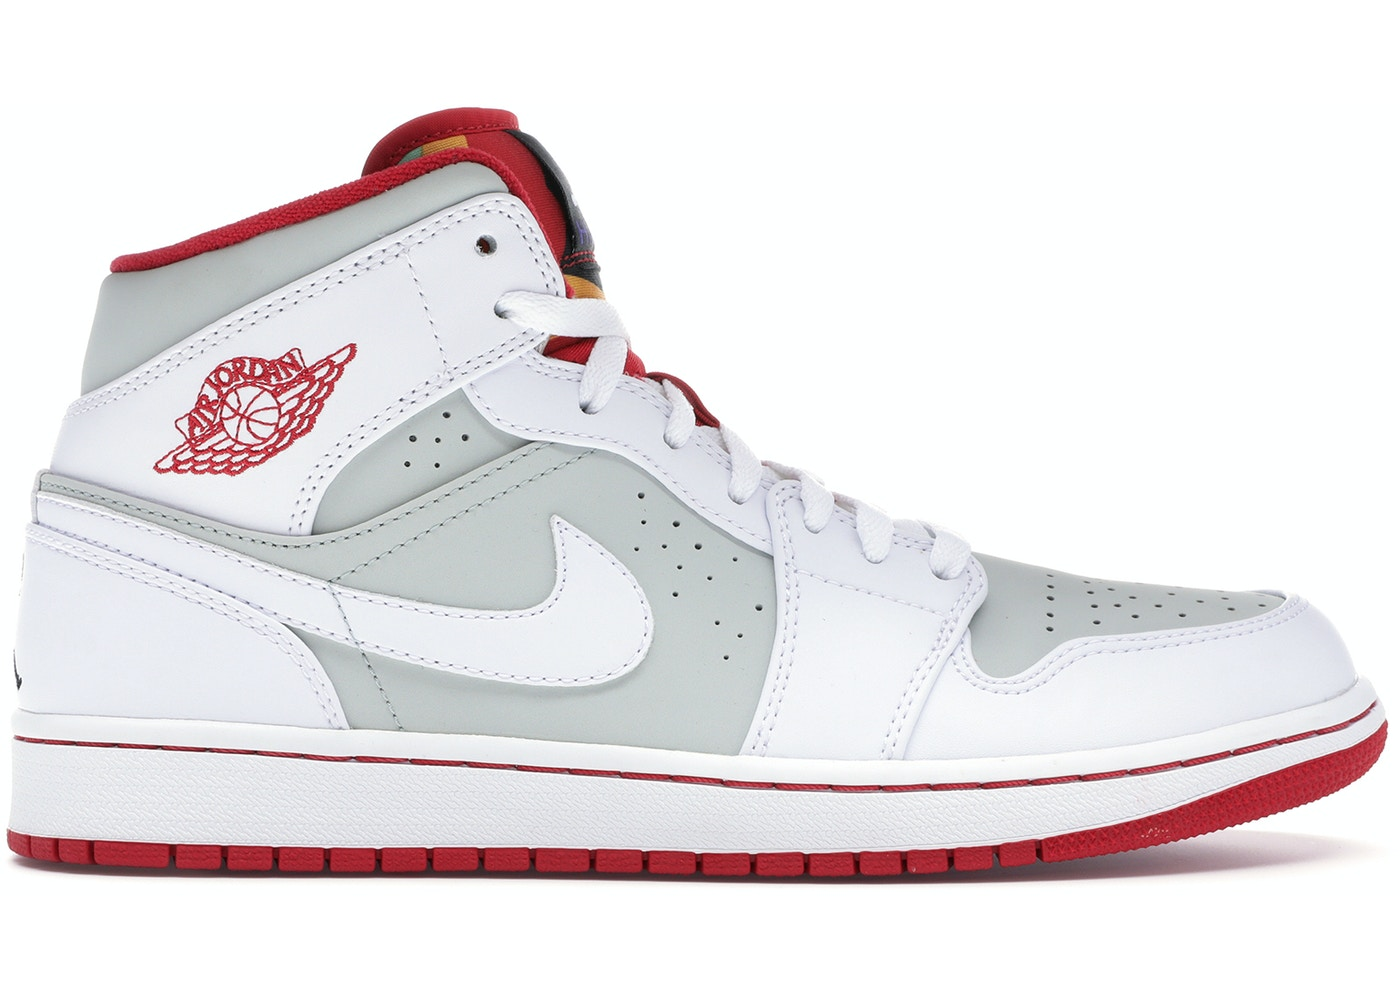 sale retailer 793b6 3c6d3 Jordan 1 Retro Hare Jordan (2009)